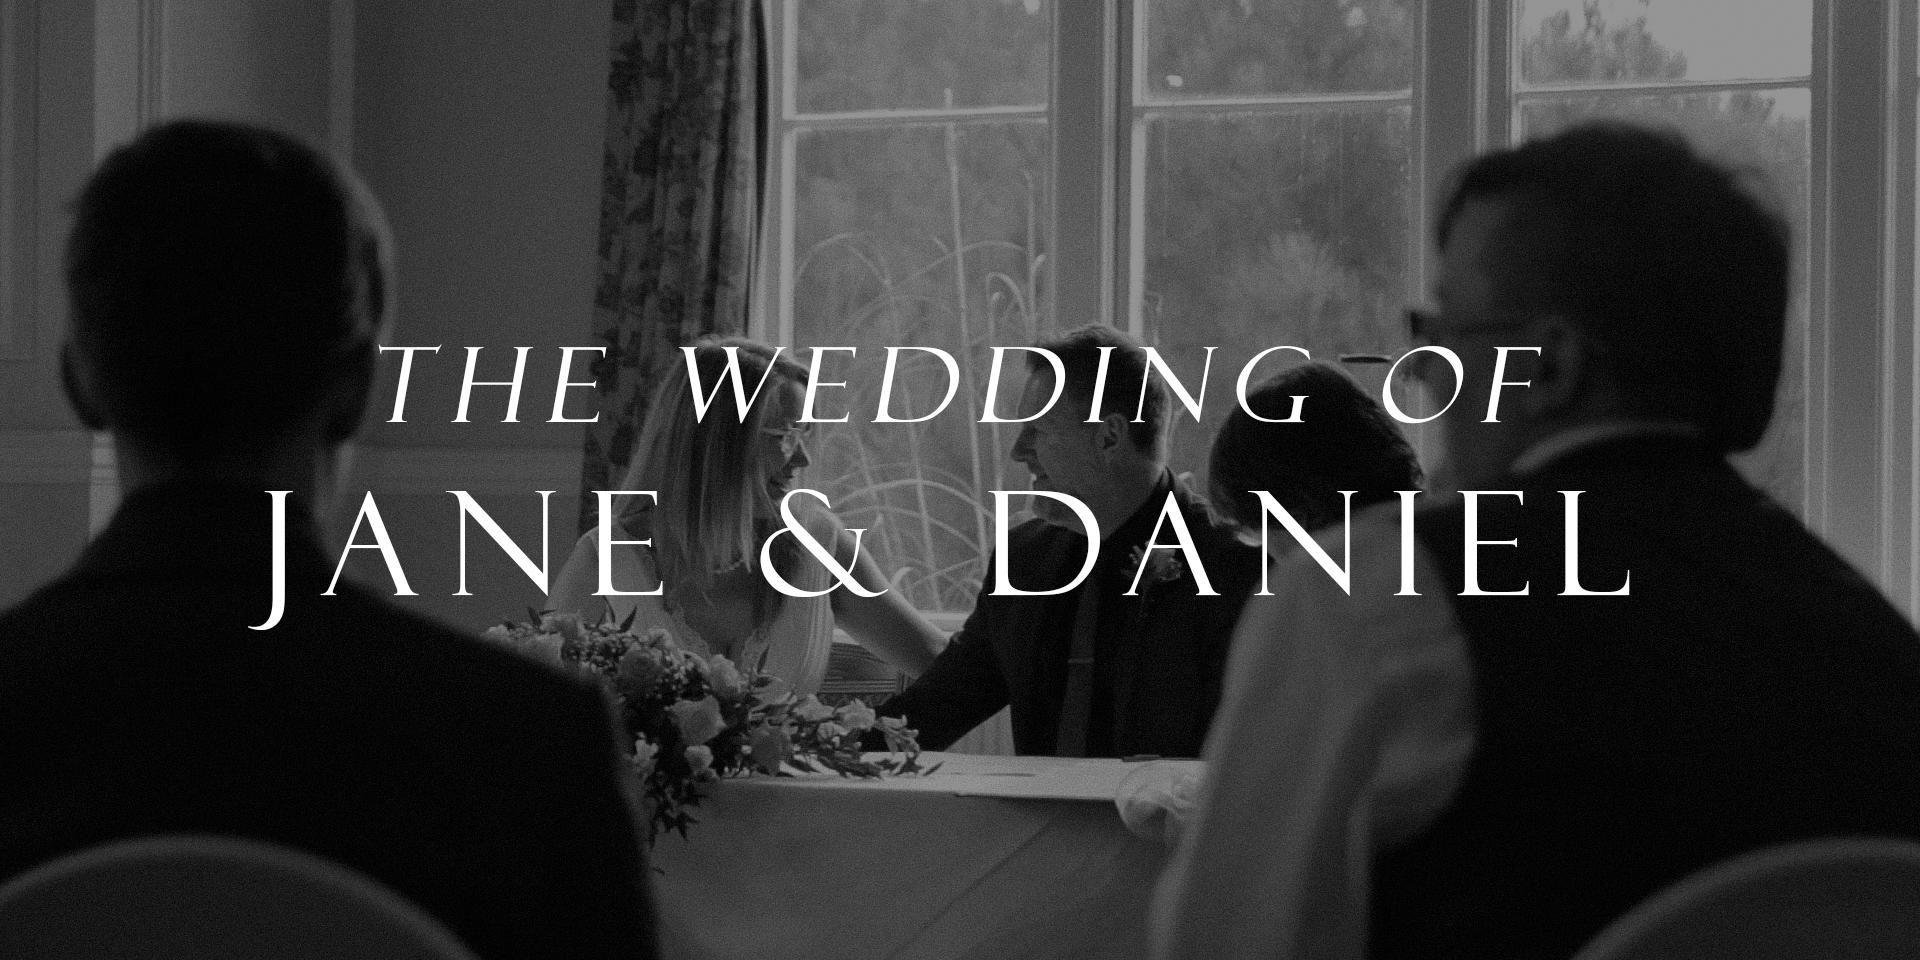 Jane and Daniel